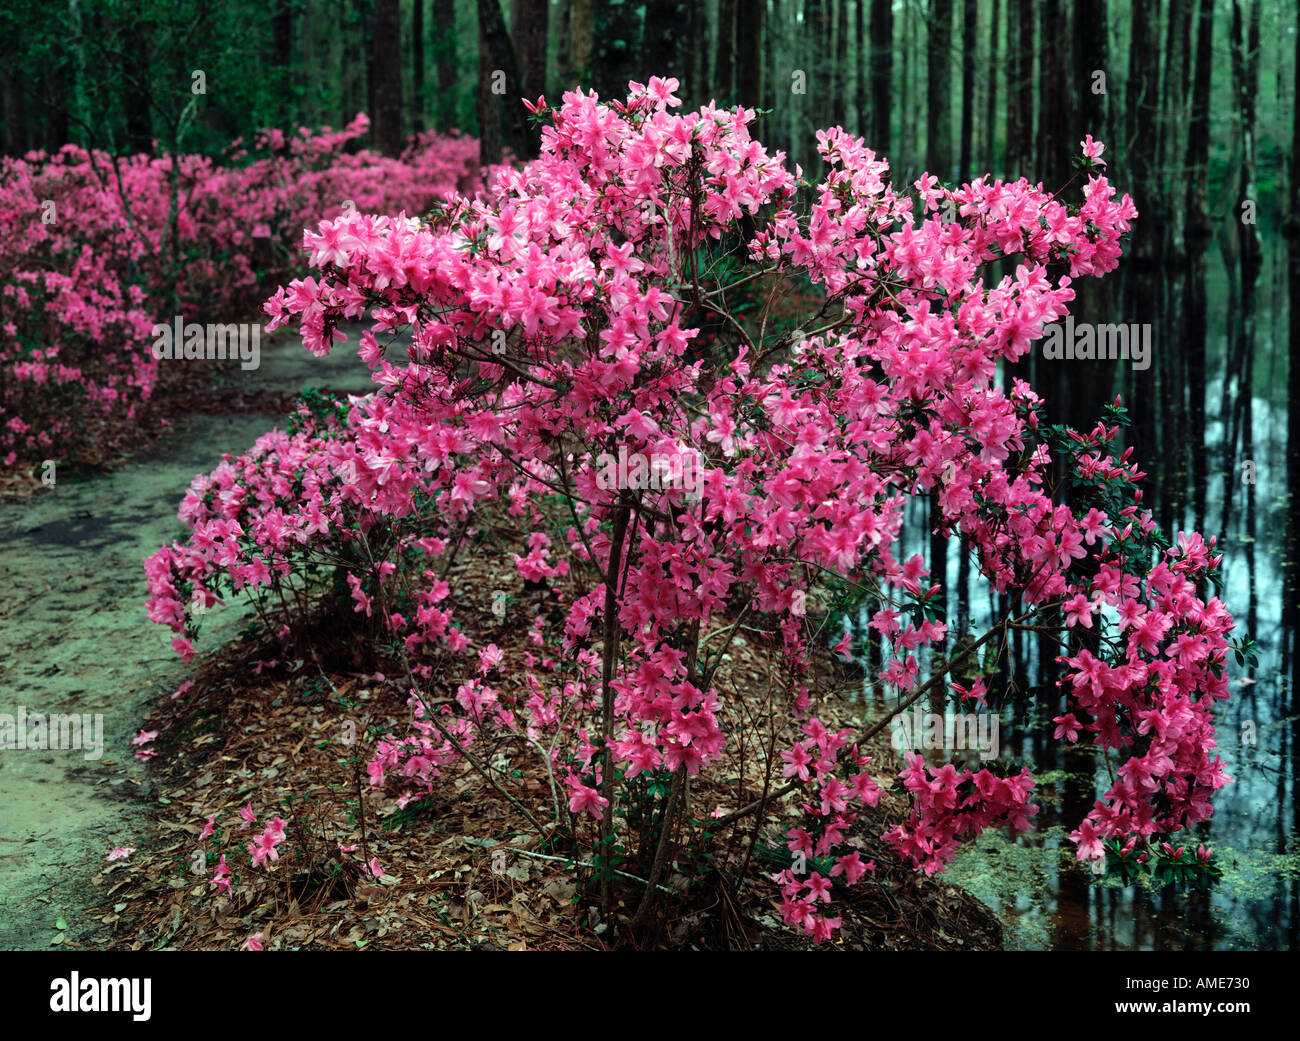 Cypress Gardens Near Charleston In South Carolina Featuring Spring